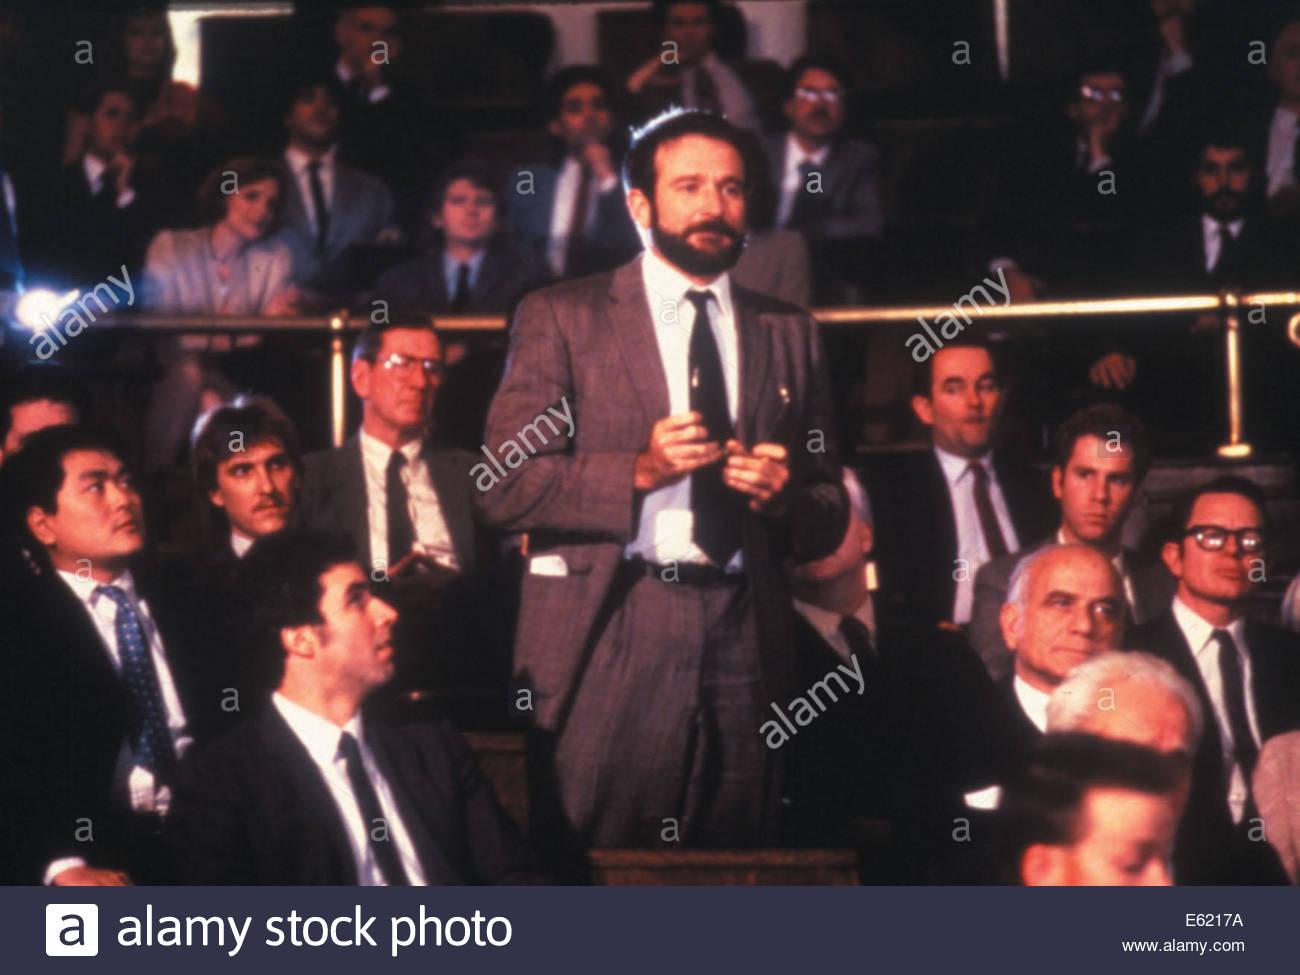 AWAKENINGS  (1990) - Stock Image